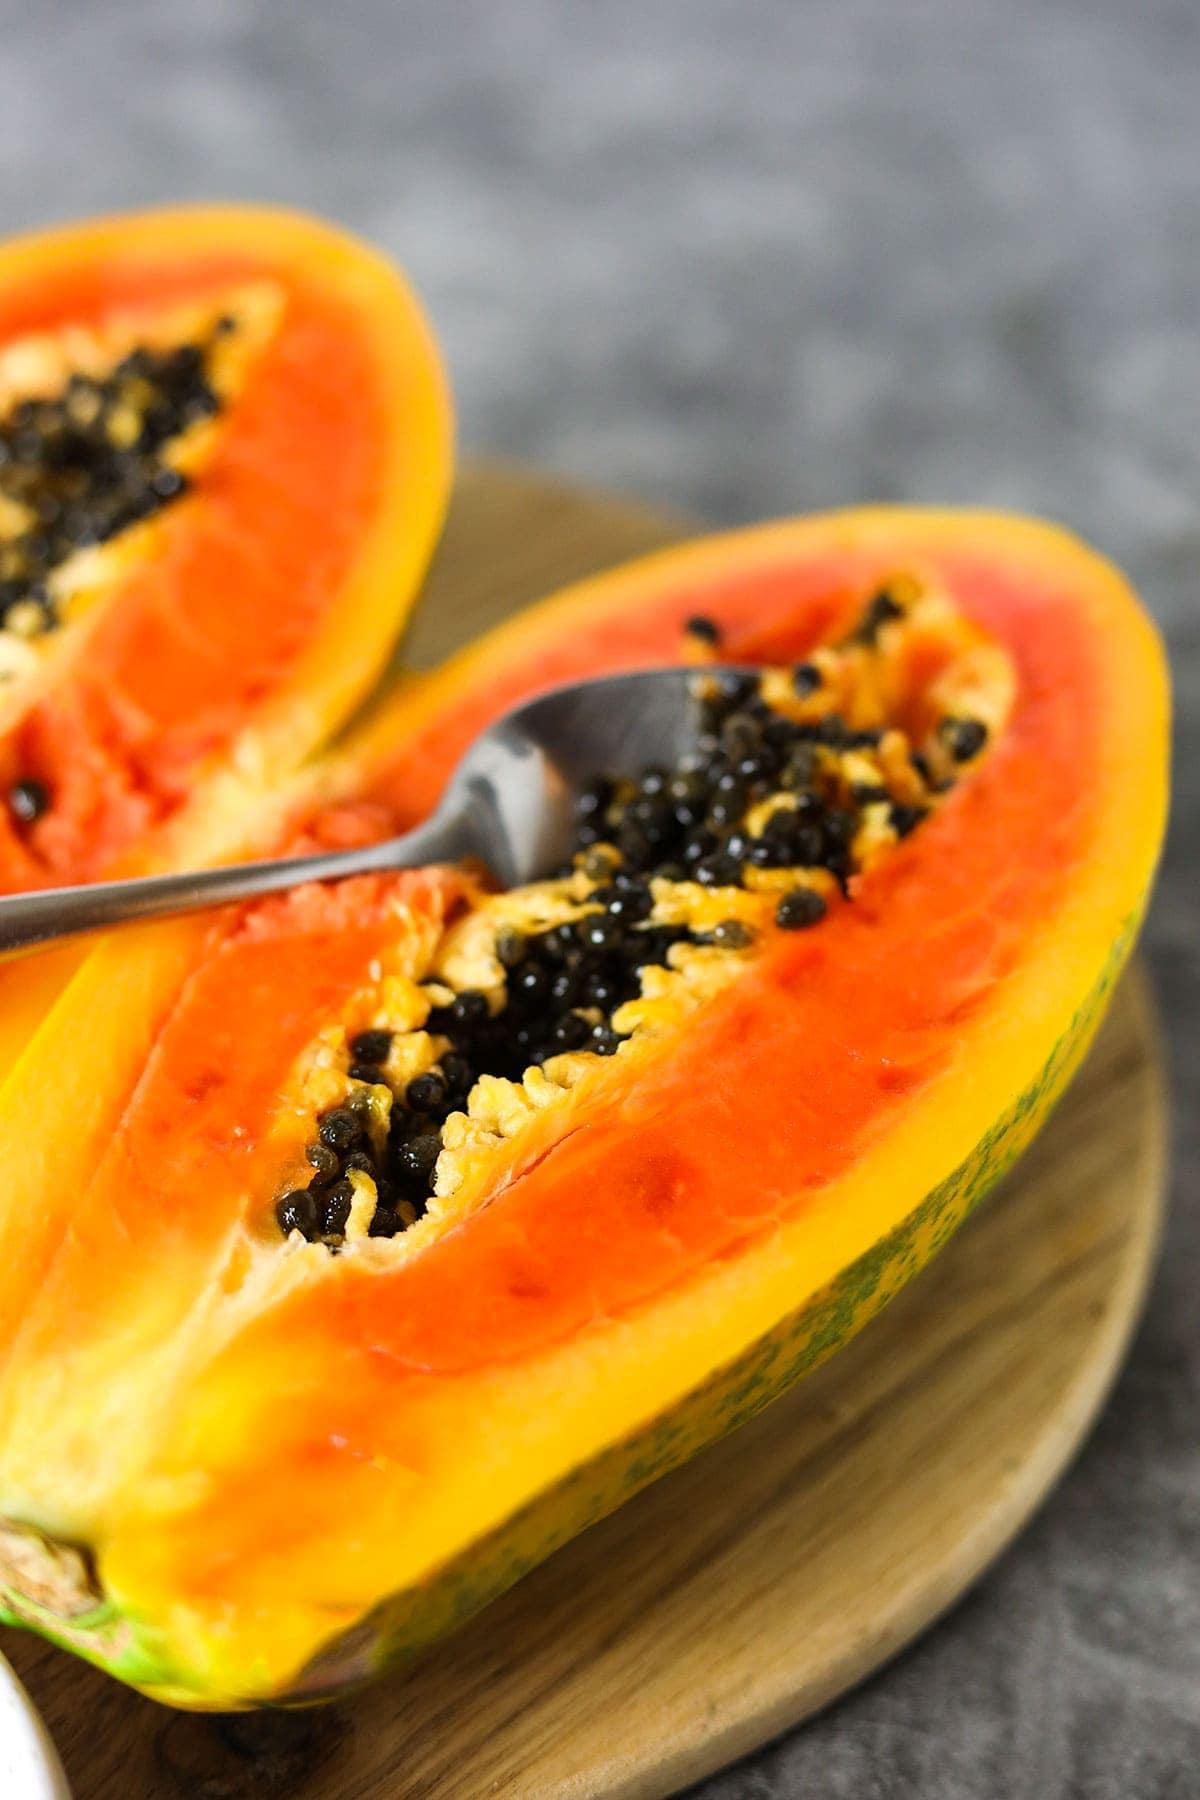 papaya for papaya salad